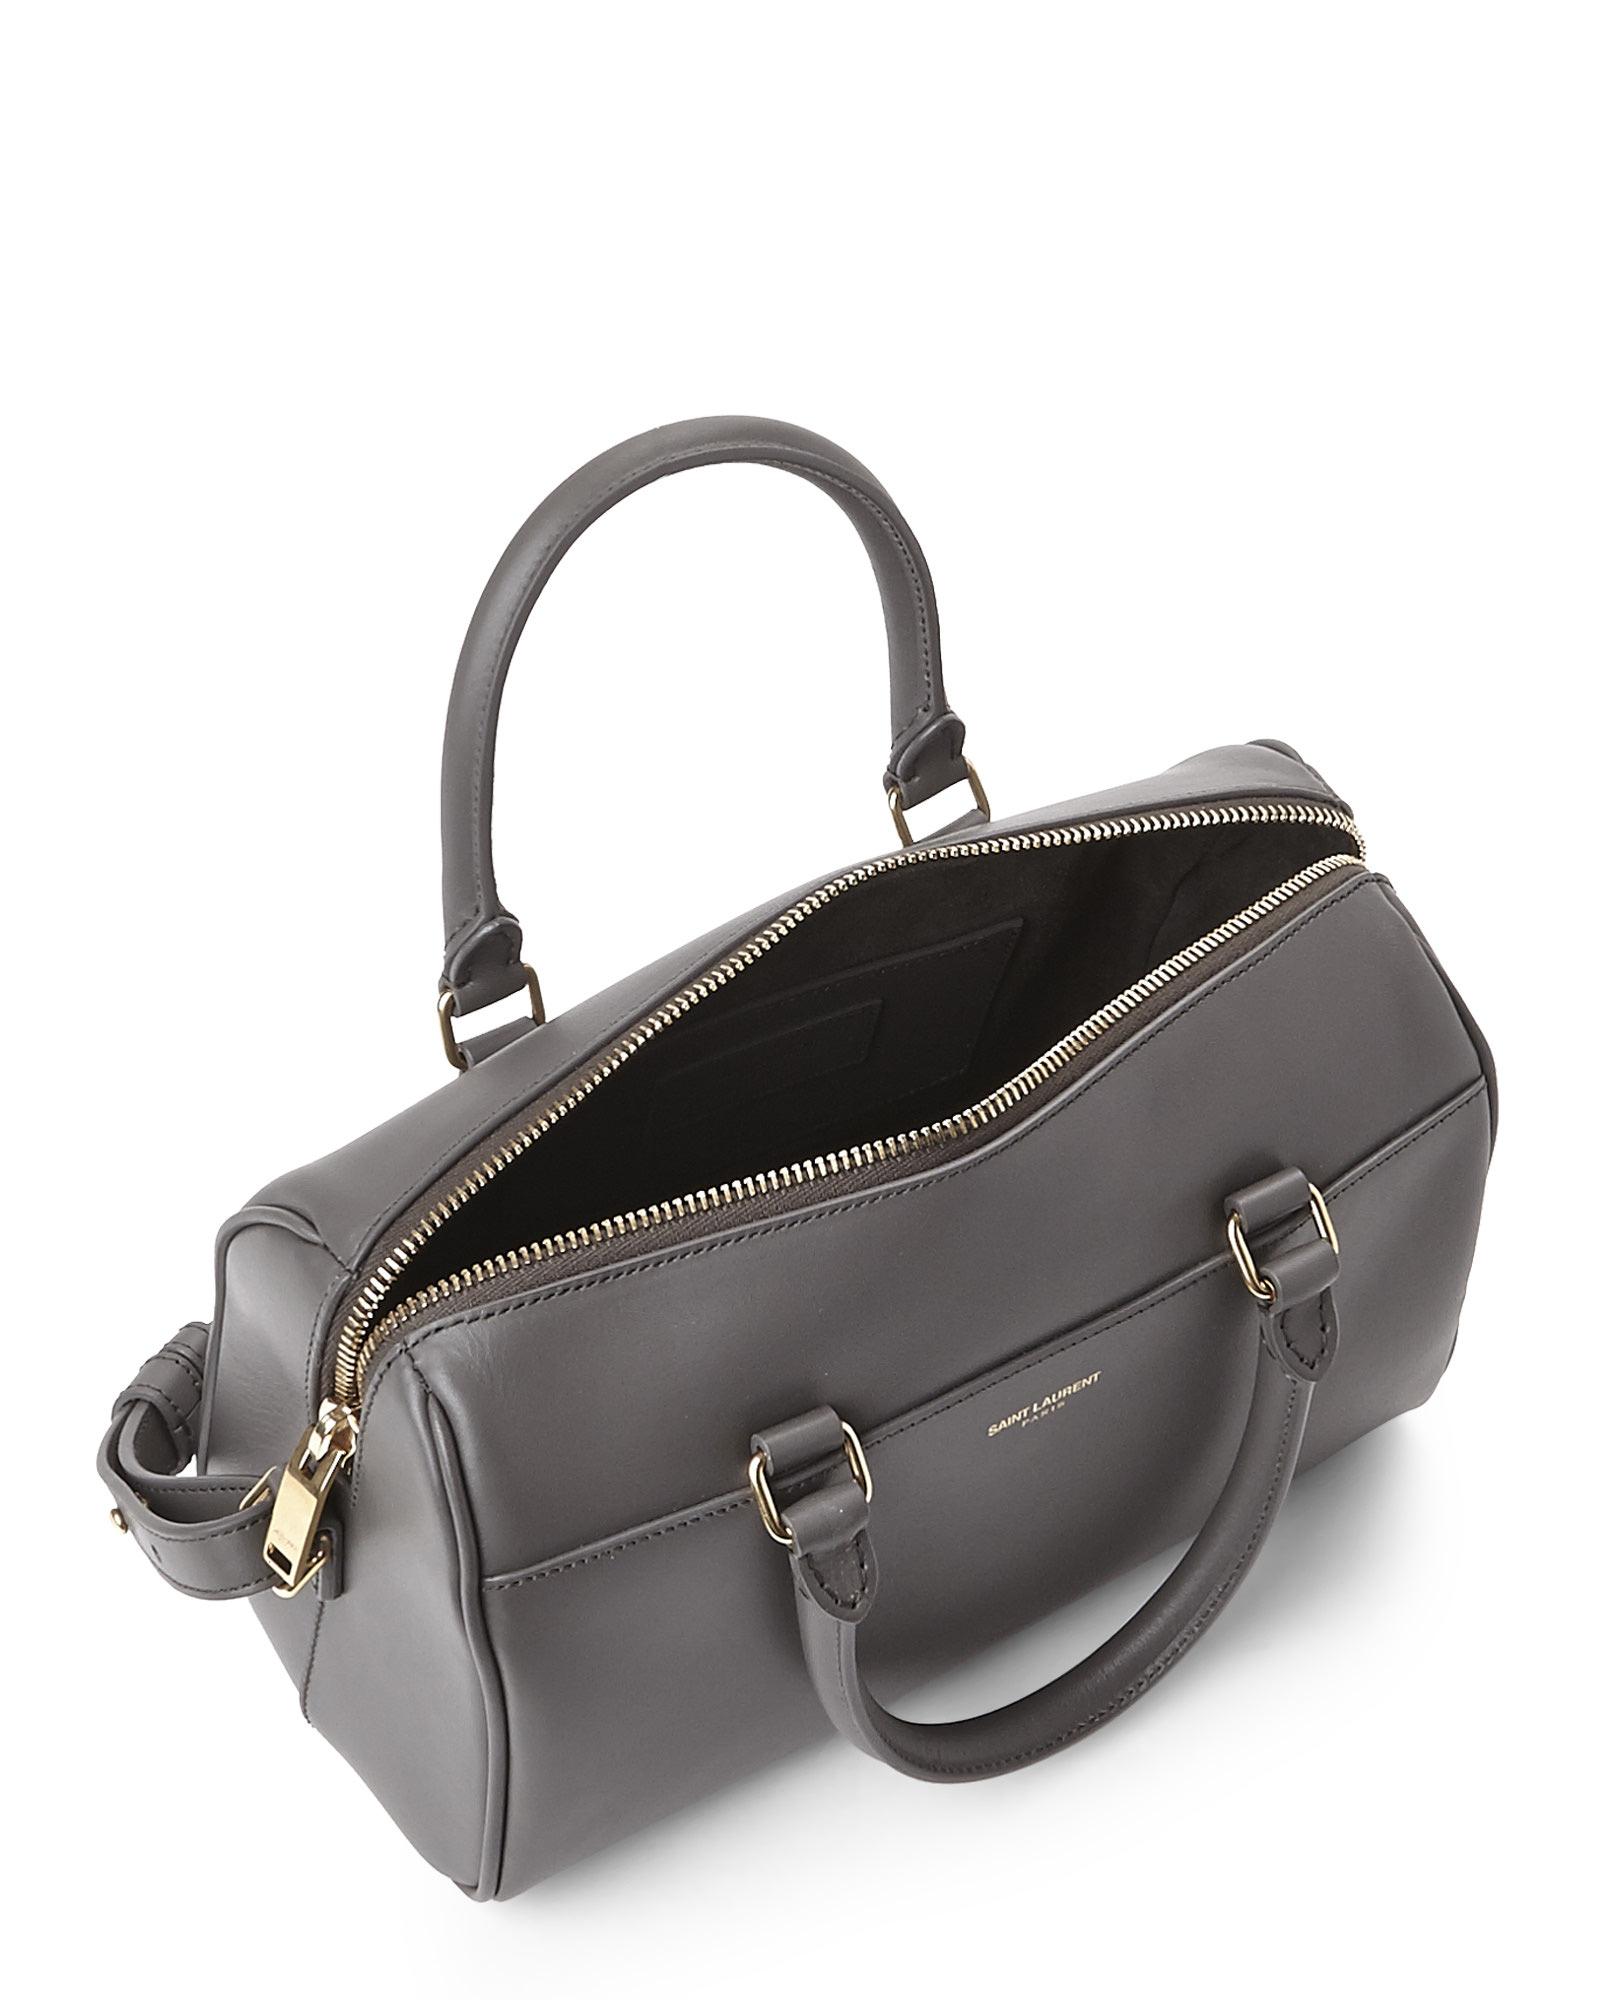 b9408fa6989 Saint Laurent Fog Baby Duffle Bag in Gray - Lyst